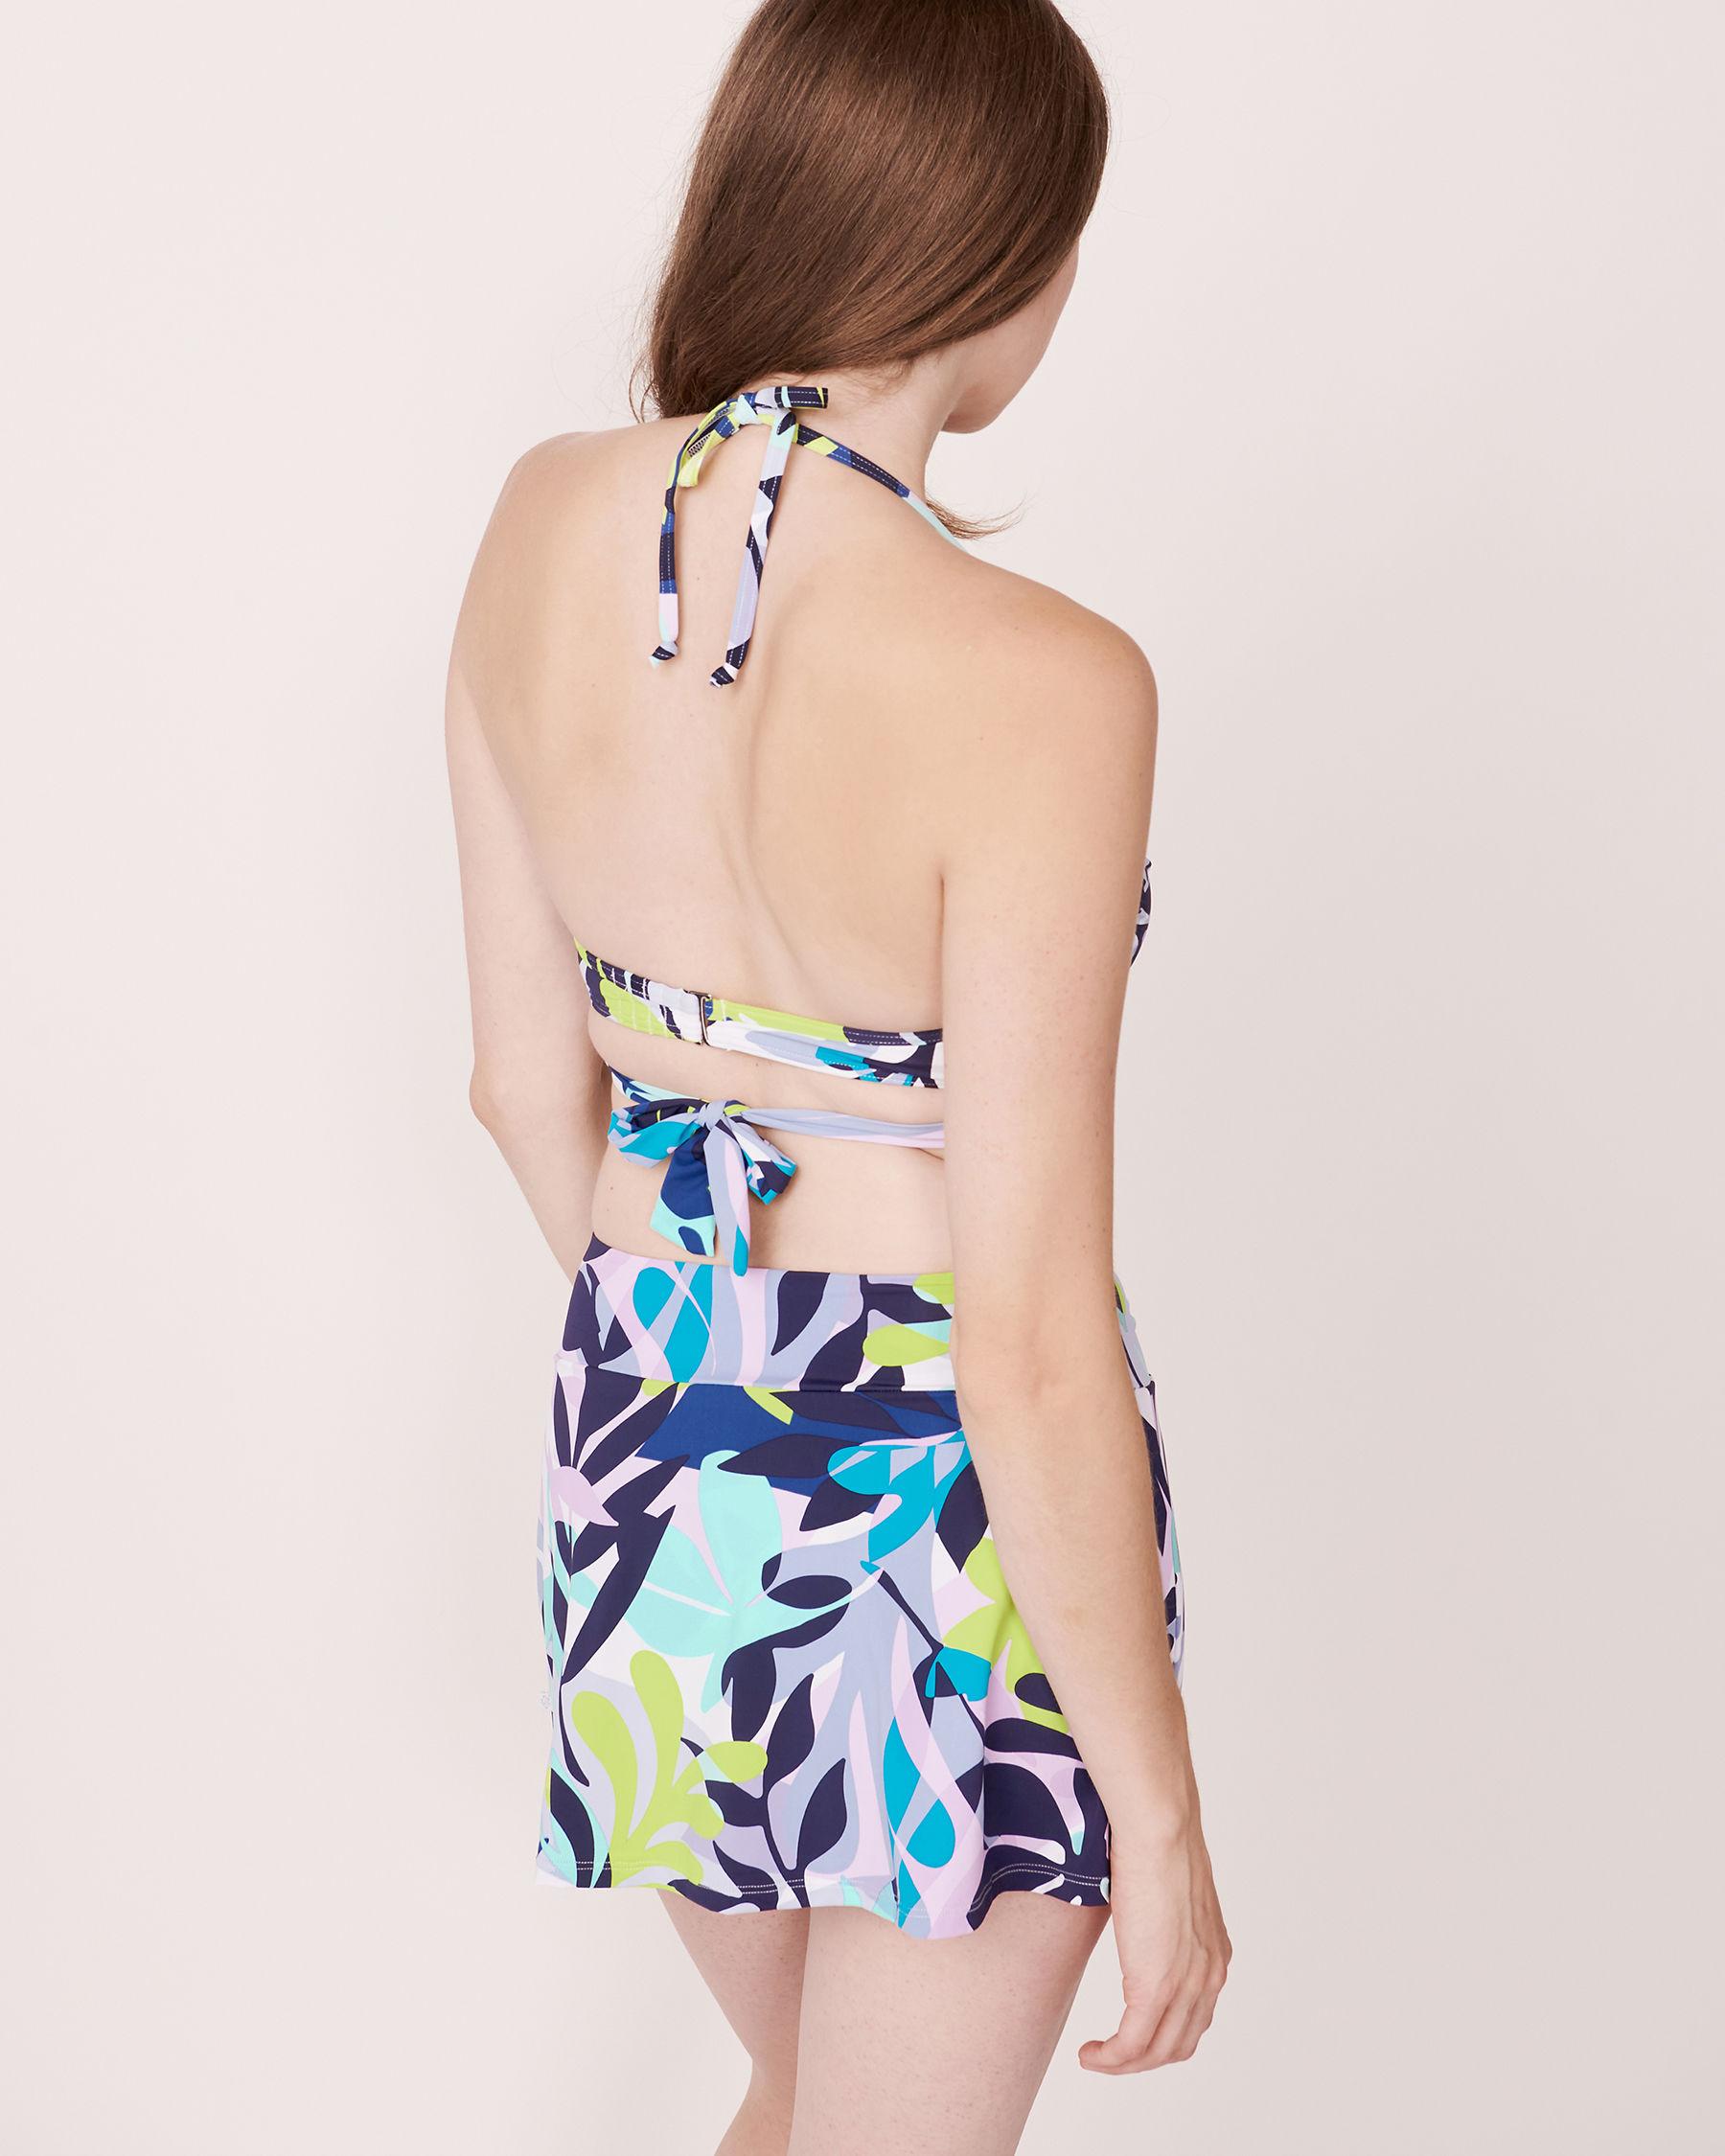 LA VIE EN ROSE AQUA SPRING LEAVES Push-up Bikini Top Leaves print 70100016 - View2